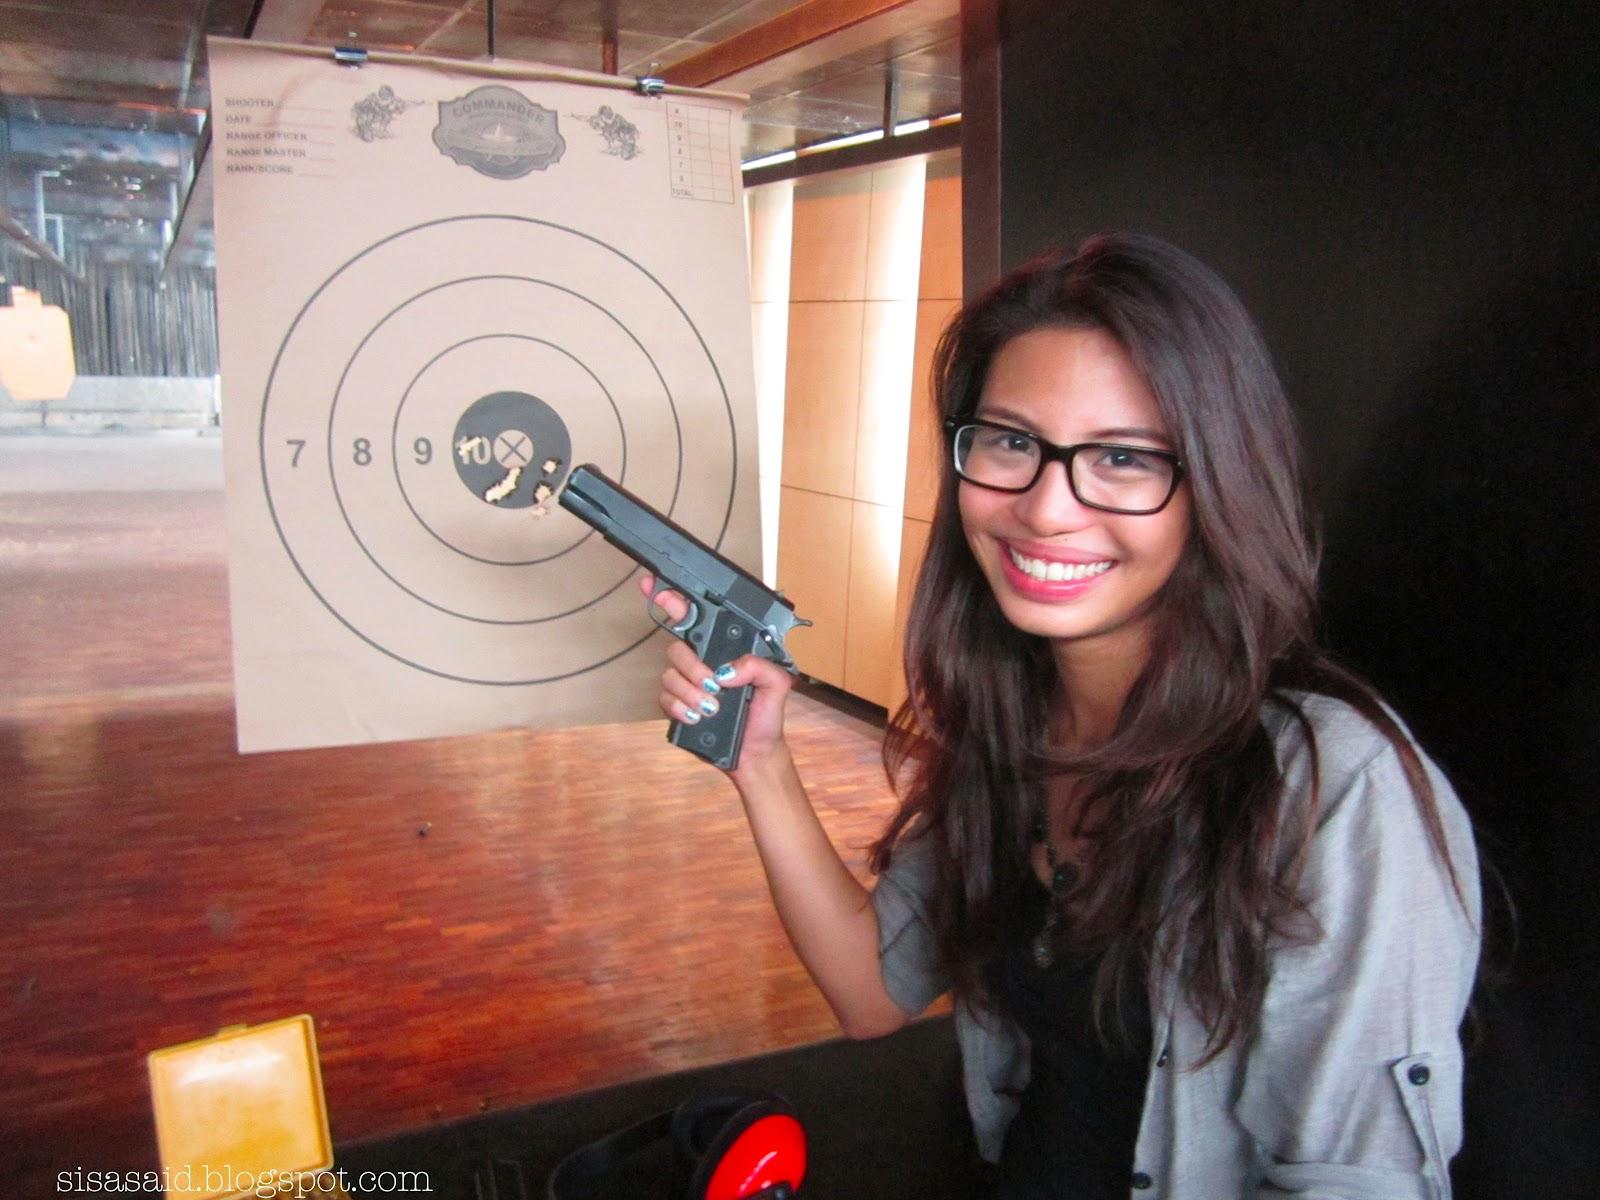 ring my bell gunslinging at the commander shooting range